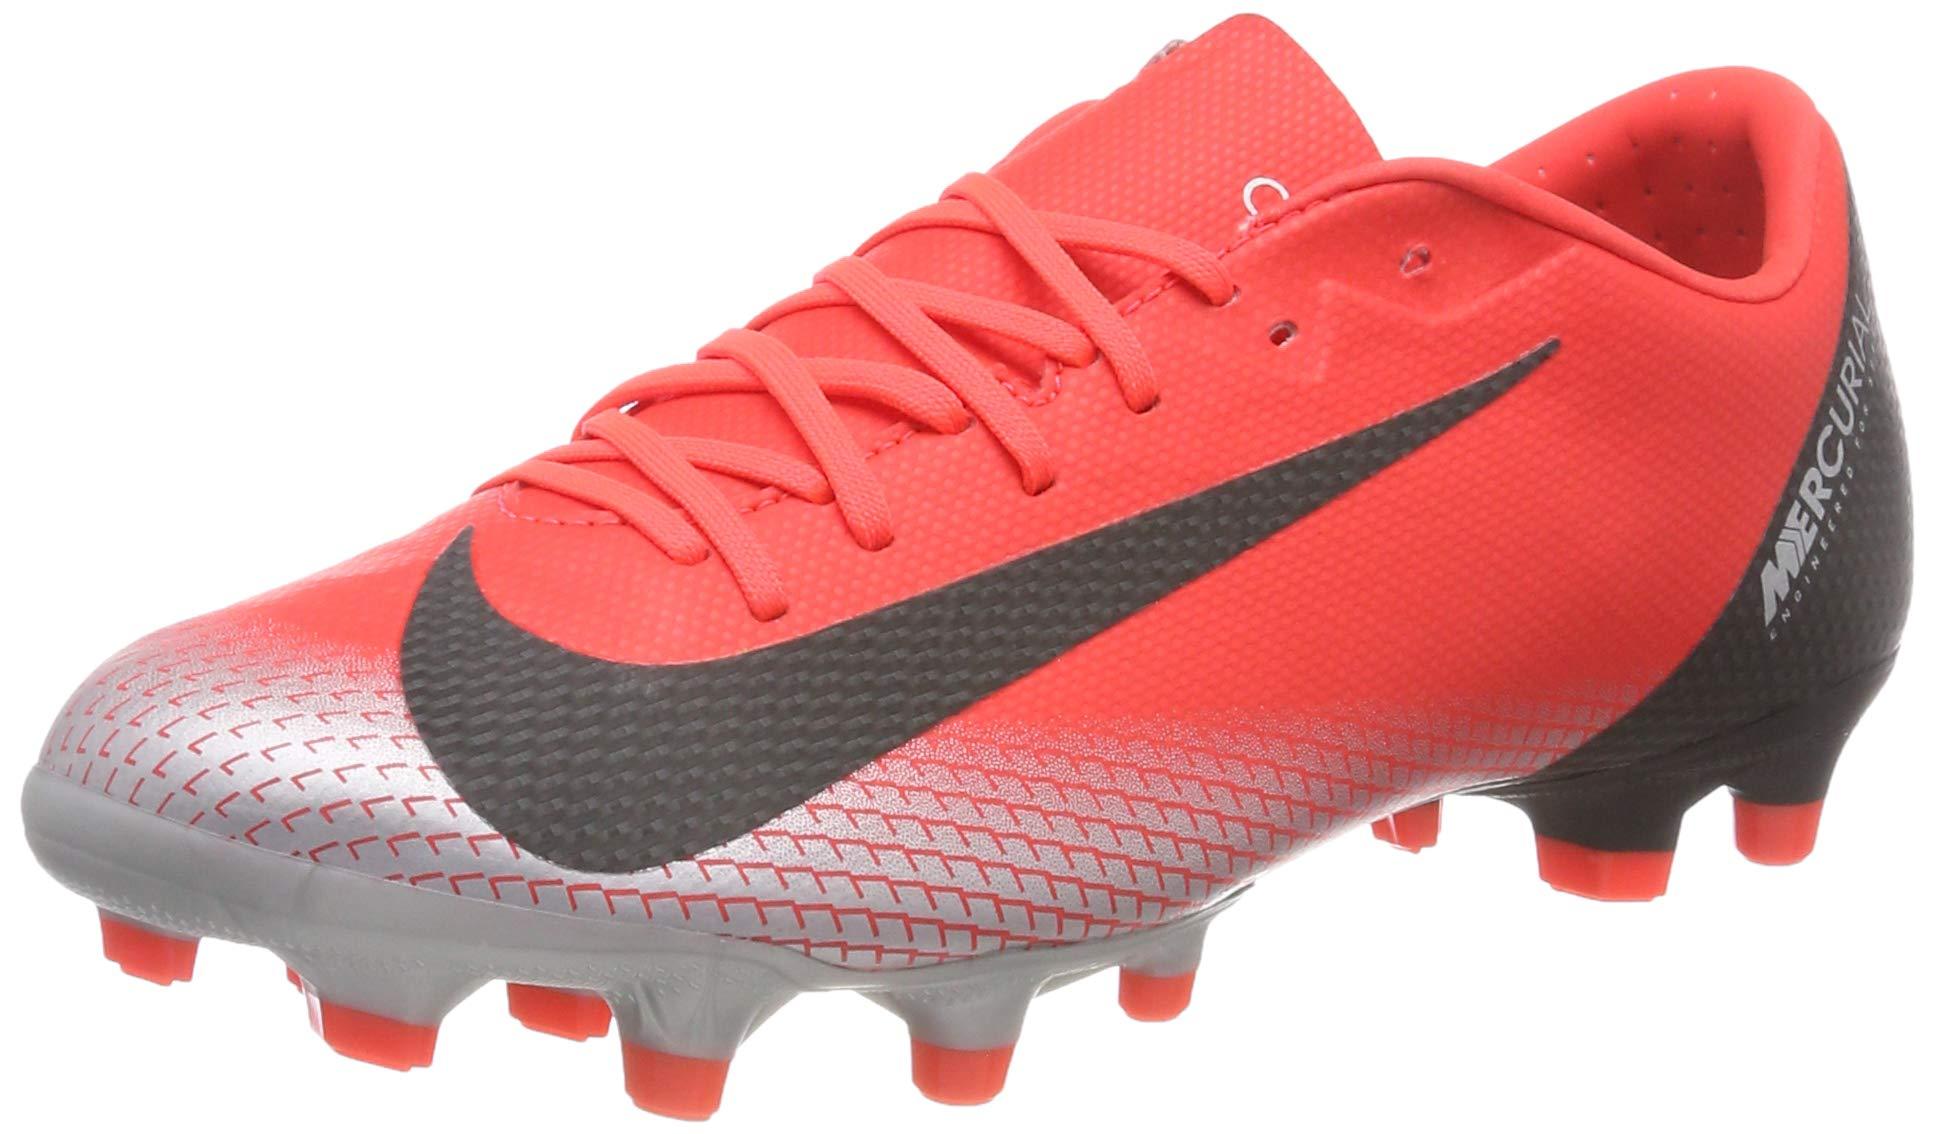 Nike Vapor 12 Academy Cr7 MG, Chaussures de Football Mixte